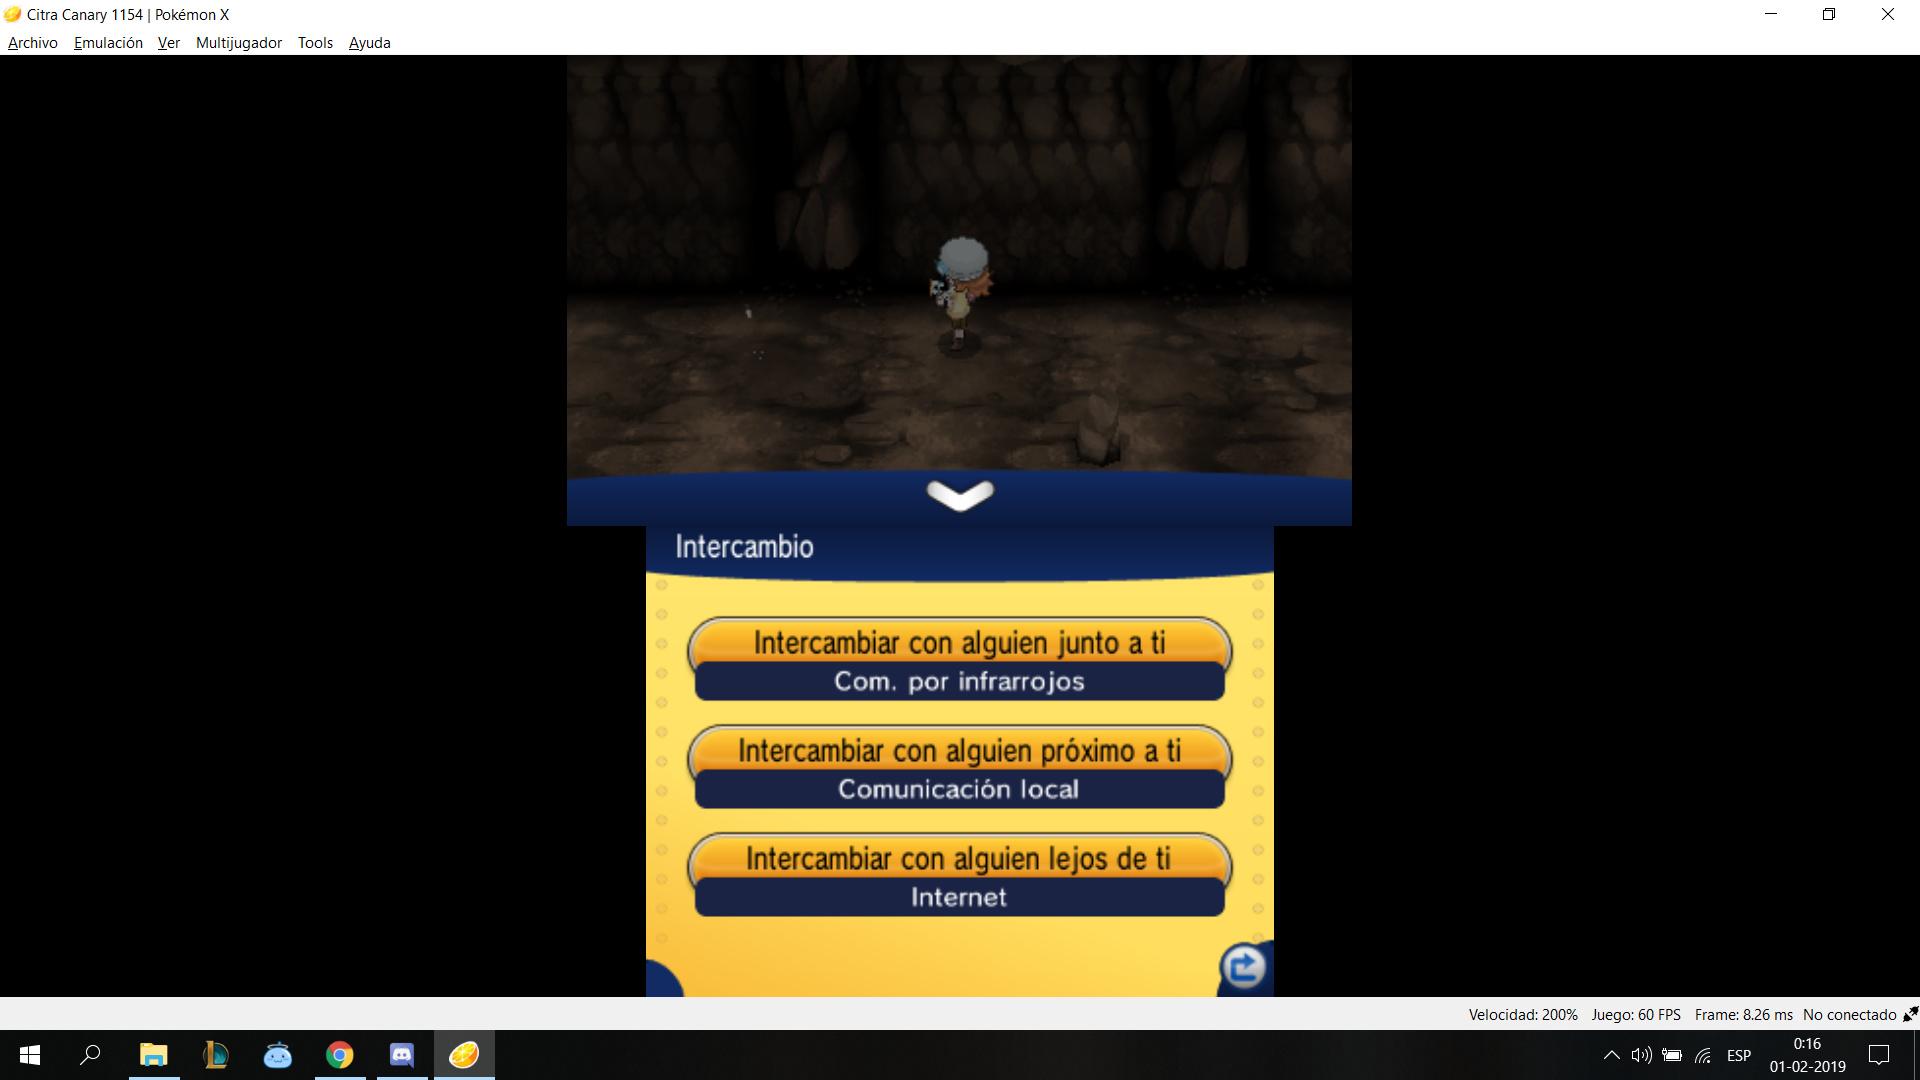 Trade pokemon x - Citra Support - Citra Community